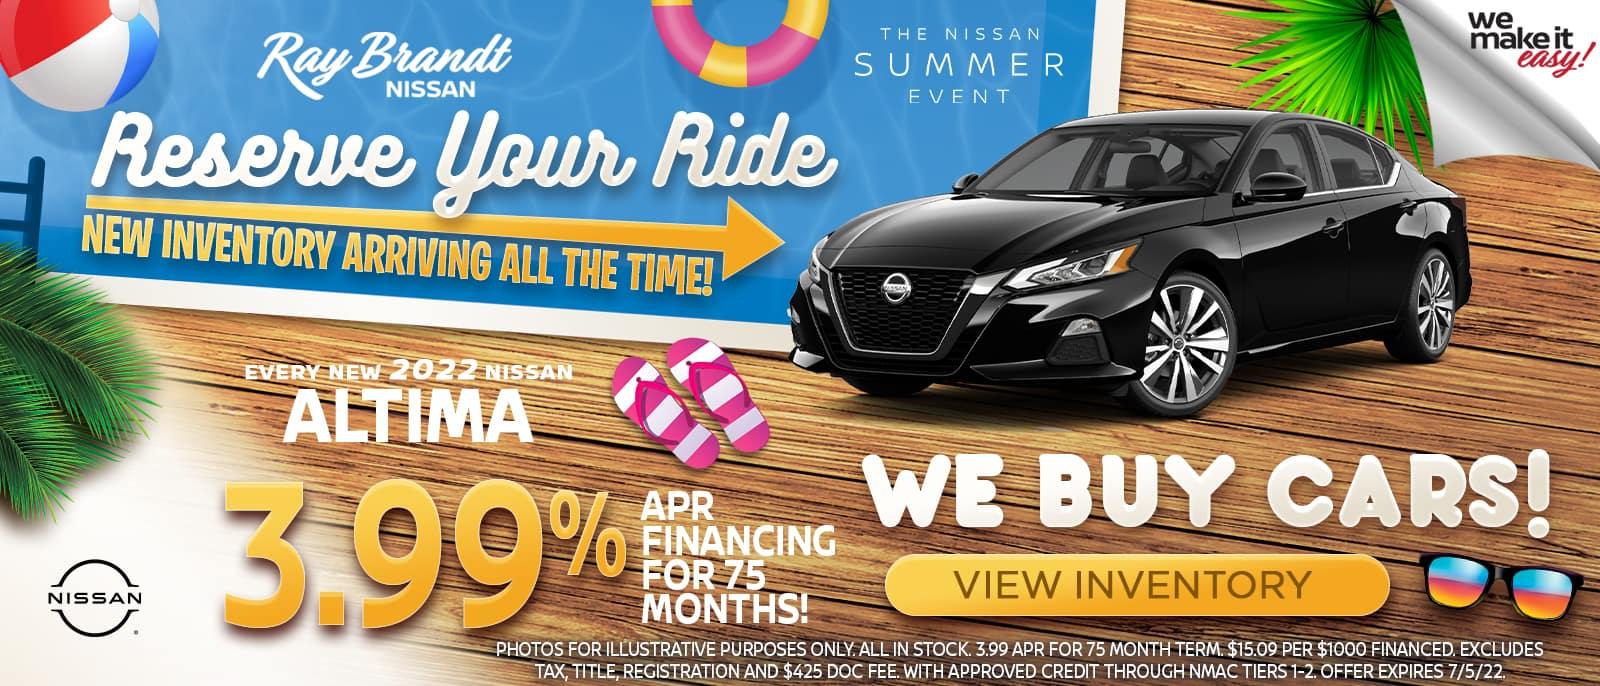 Nissan Altima Sales Special, Summer Savings